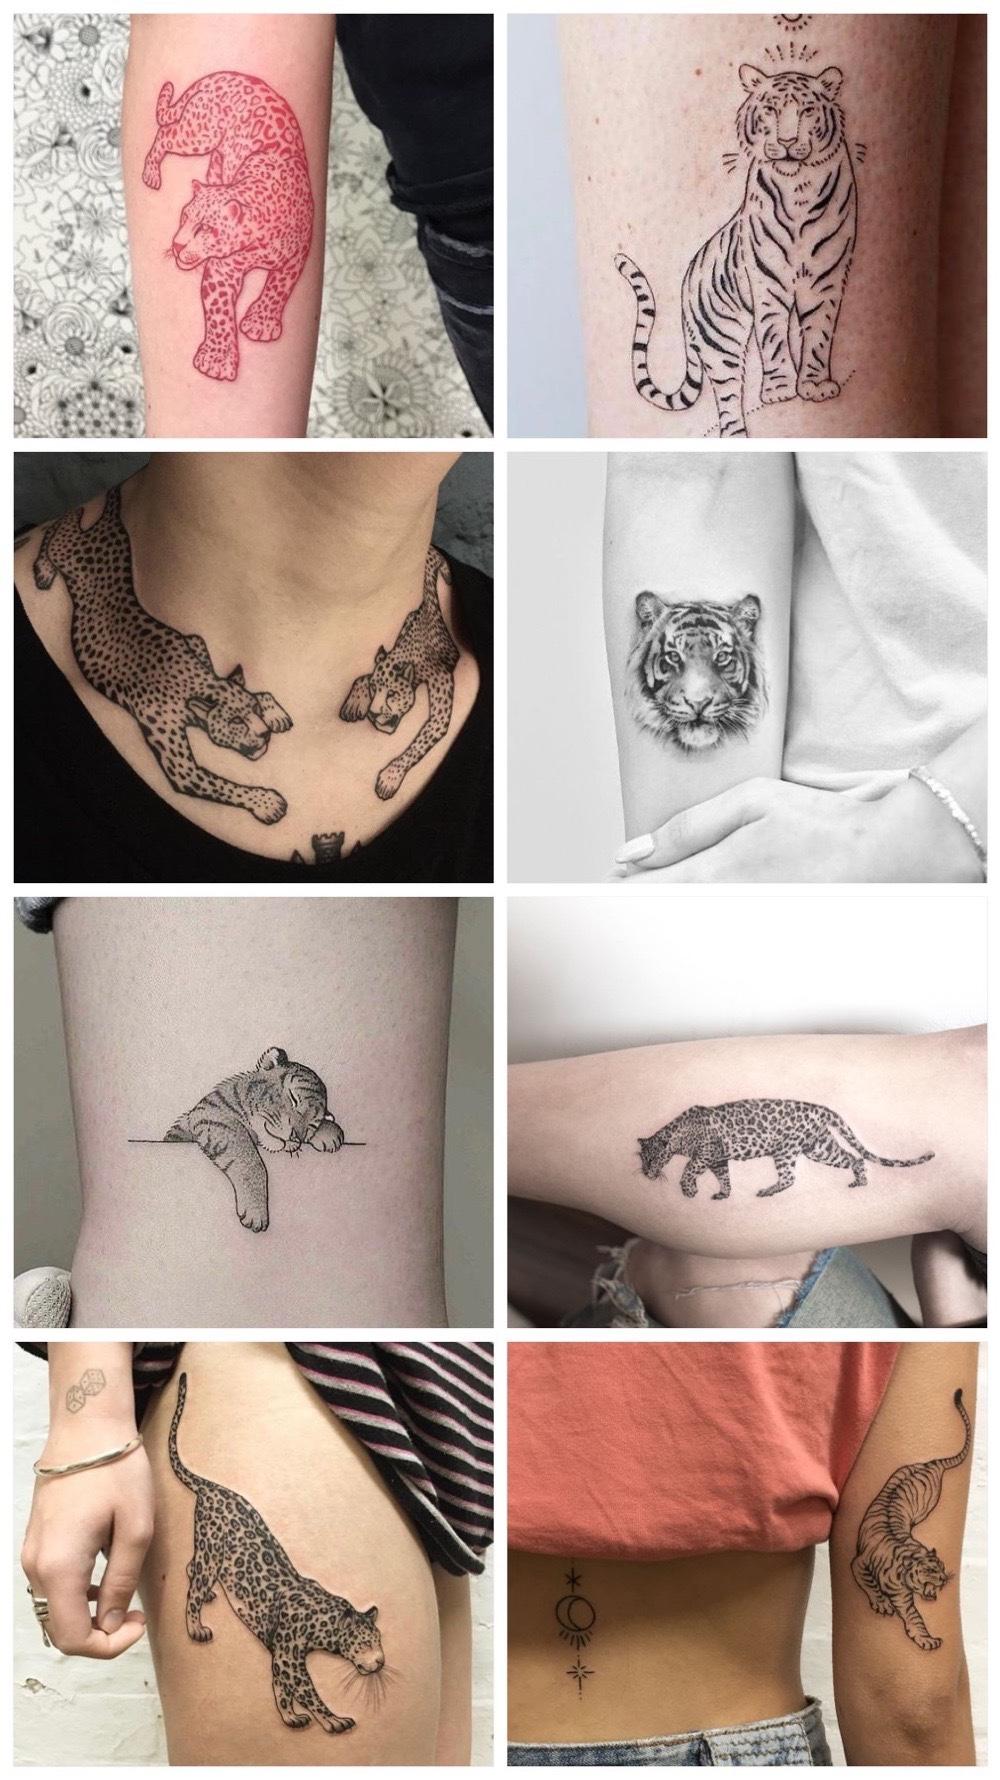 tijger tattoos